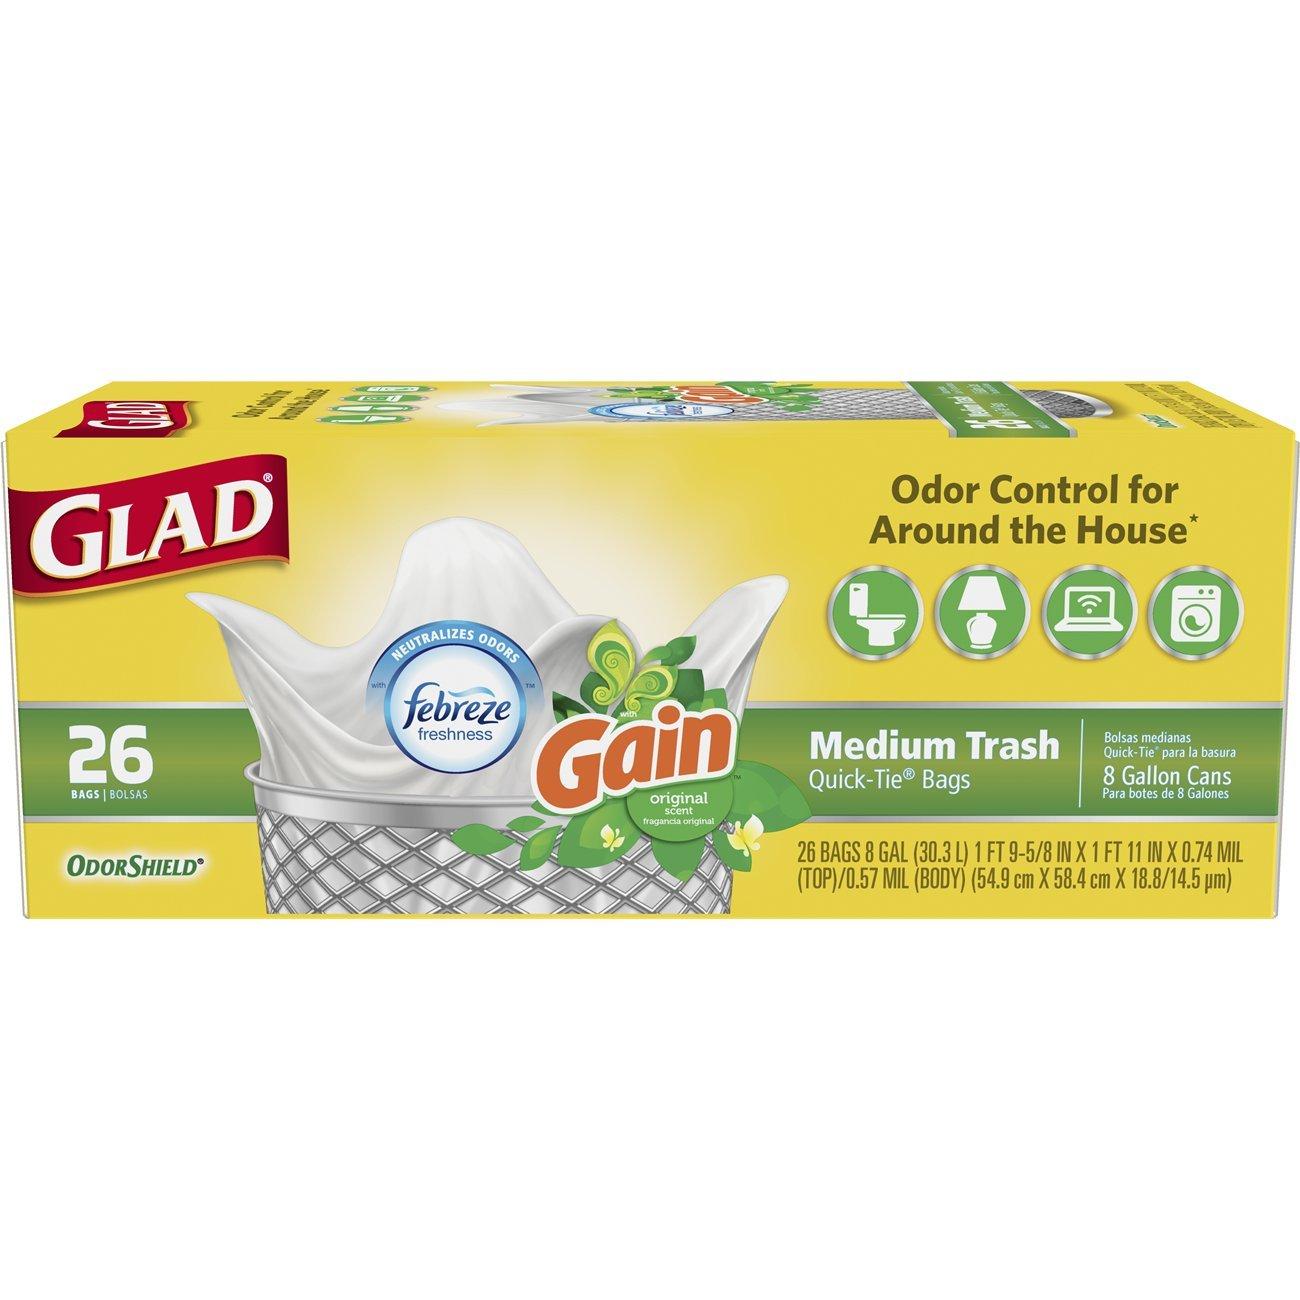 Glad OdorShield Quick-Tie Medium Trash Bags - Gain Original with Febreze Freshness,8 Gallon, 26 Count (Pack of 6)